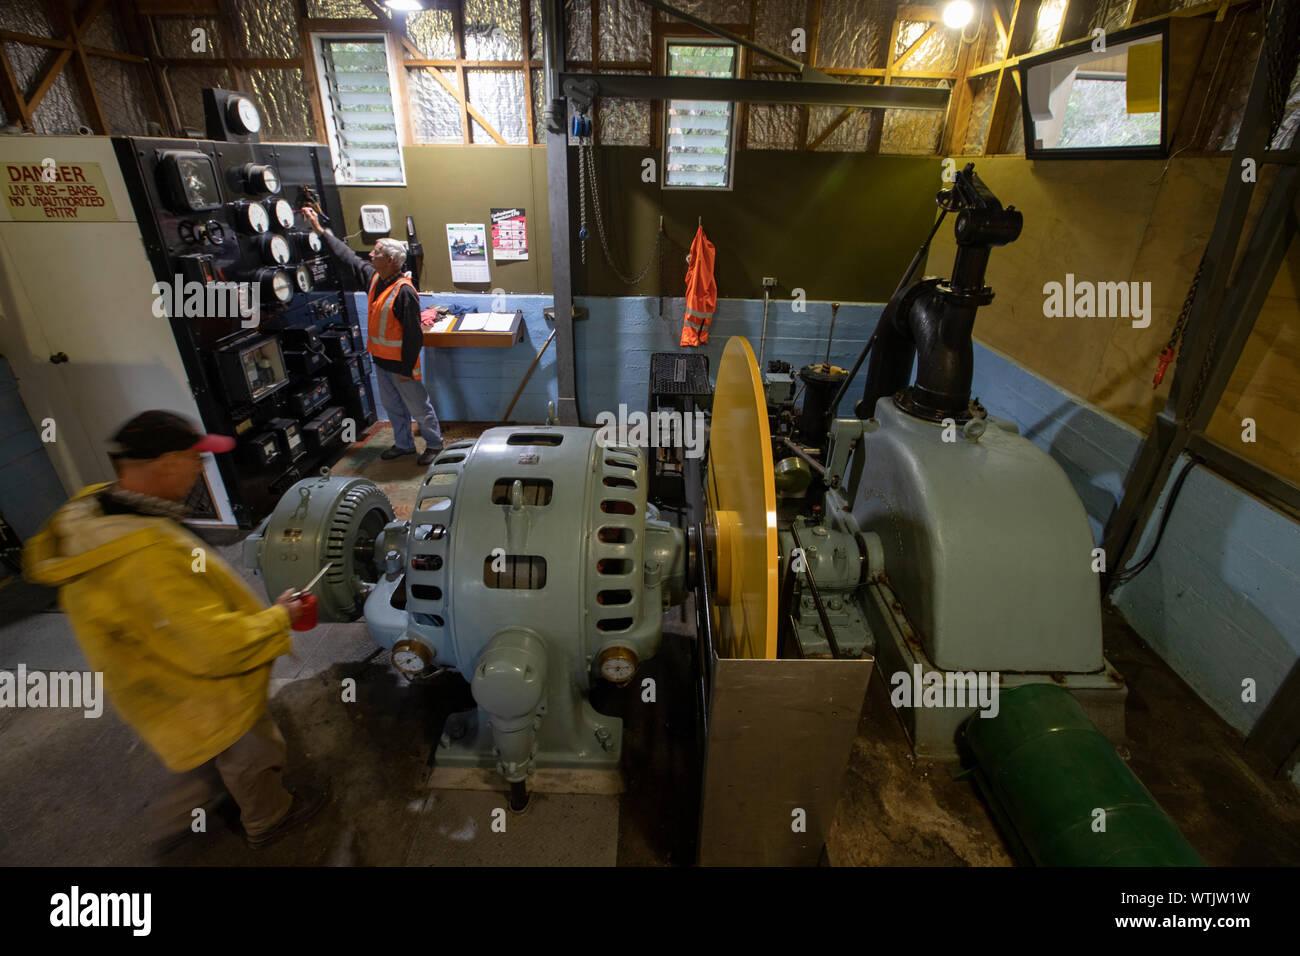 Picture by Tim Cuff - 8 May 2019 - Pupu Hydro power generator scheme, Golden Bay, New Zealand: Four Corners Stock Photo